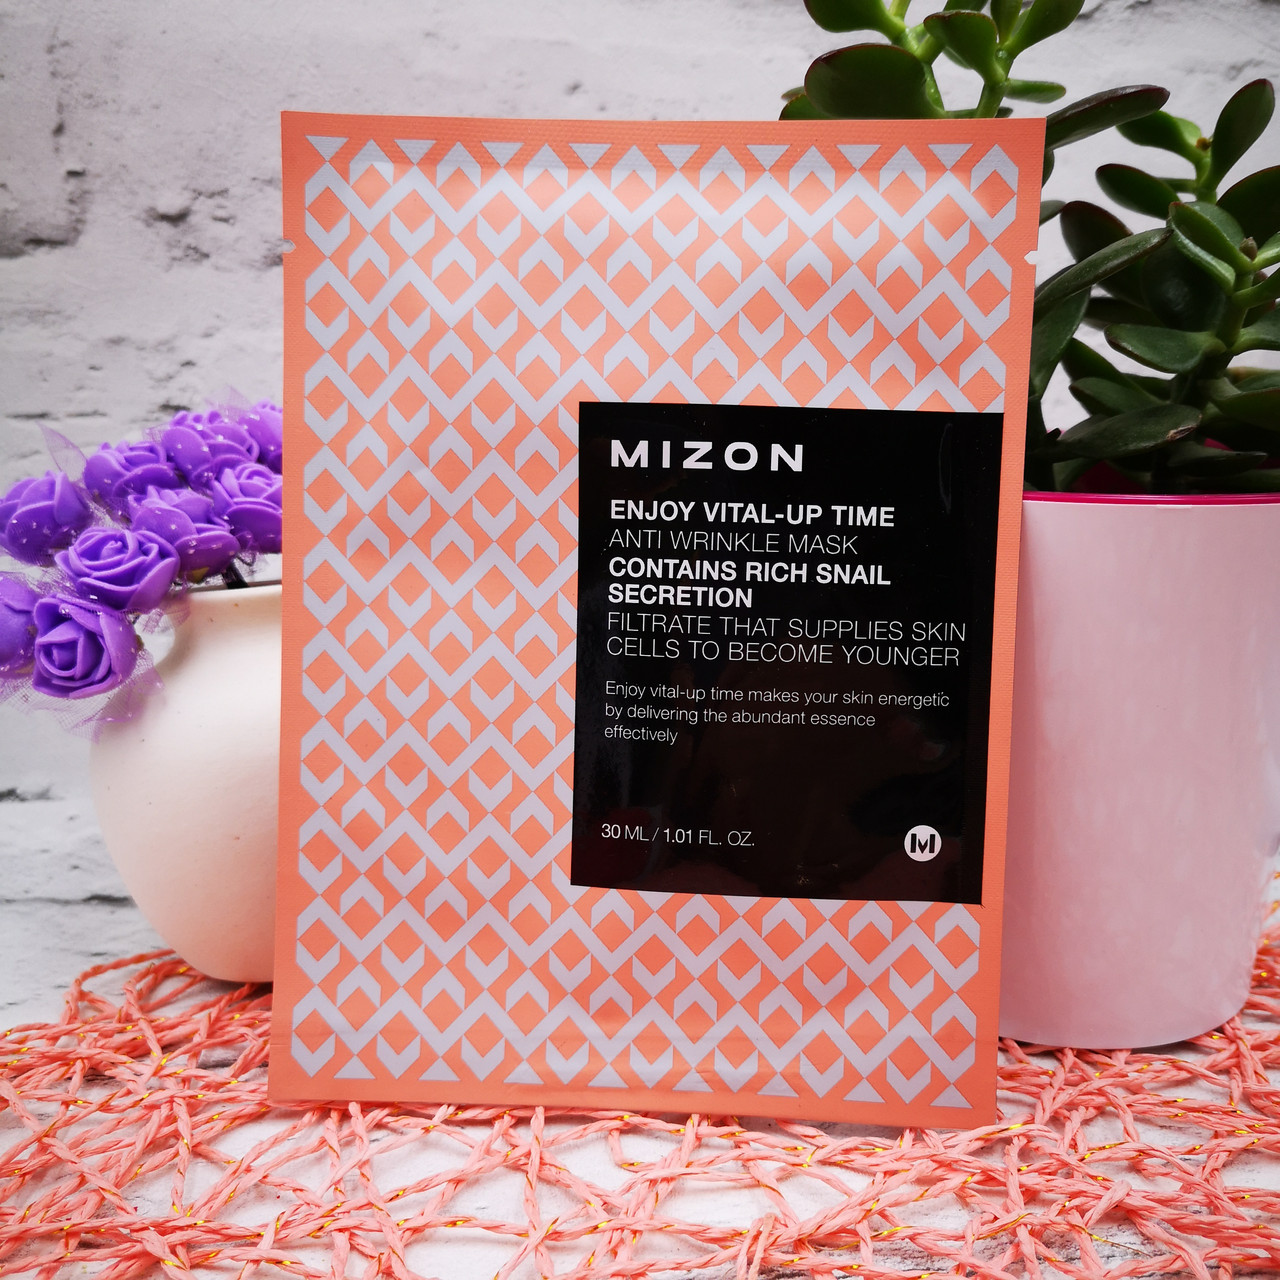 Mizon Антивозрастная регенерирующая тканевая маска с муцином улитки Enjoy Vital-Up Time Anti-Wrinkle Mask